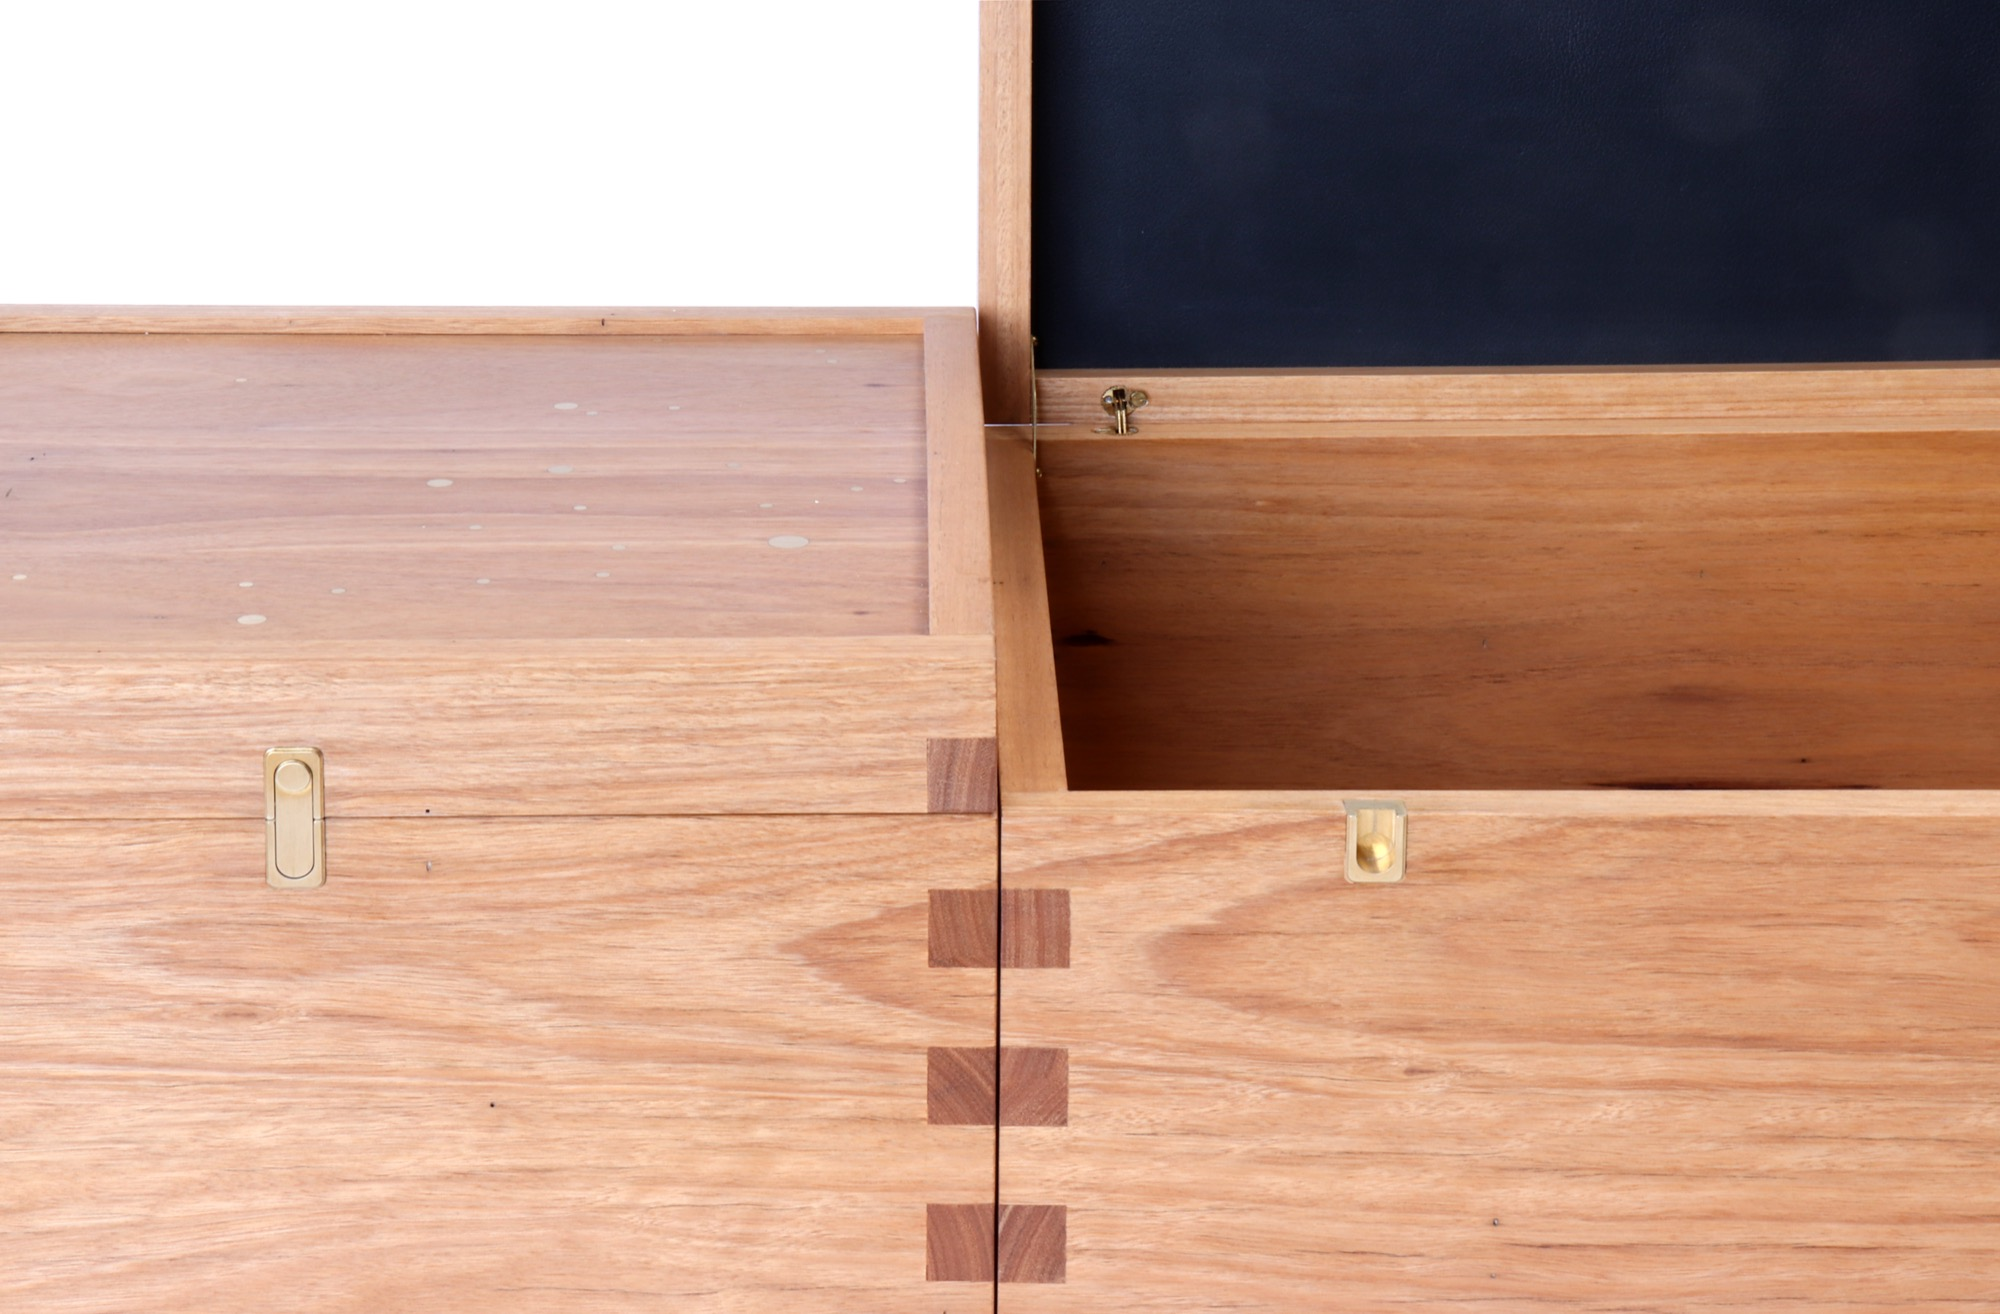 Star Boxes by Sawdust Bureau 2000 res_09